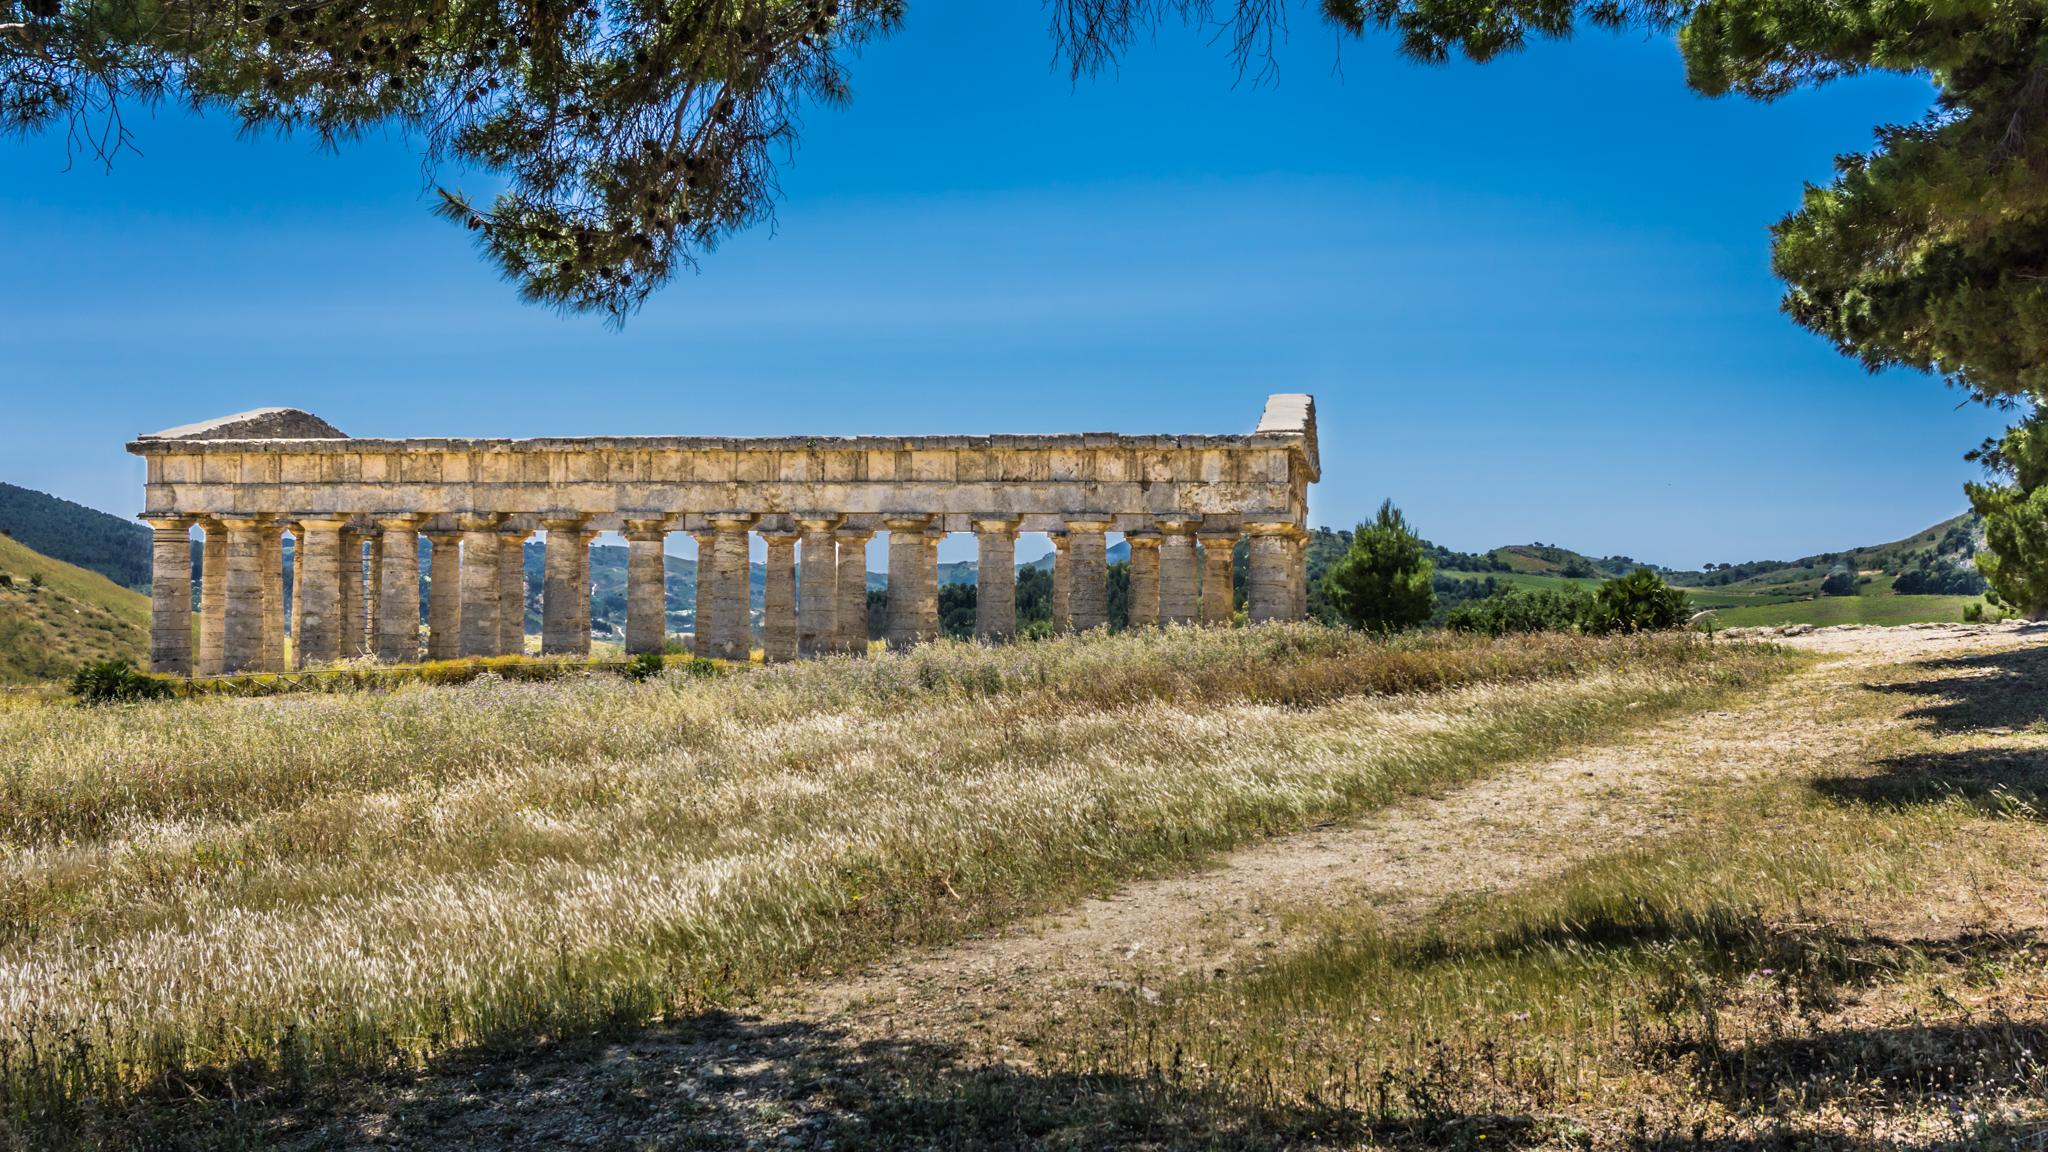 Doric Temple at Segesta, Italy